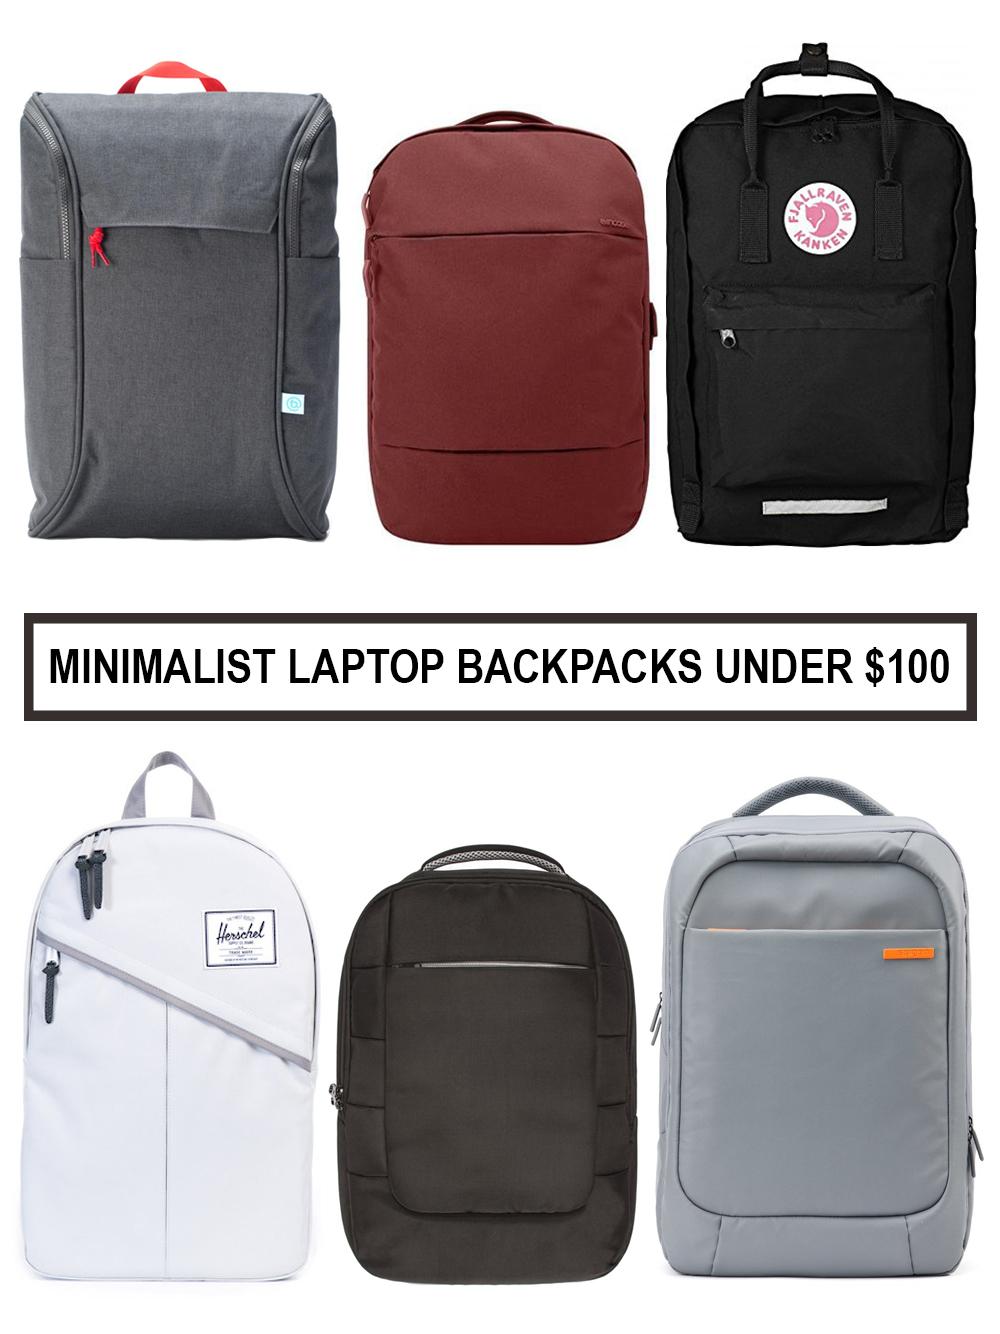 cd86d935ec Top Picks for Minimalist Laptop Backpacks under  100 — Minimalist Guy